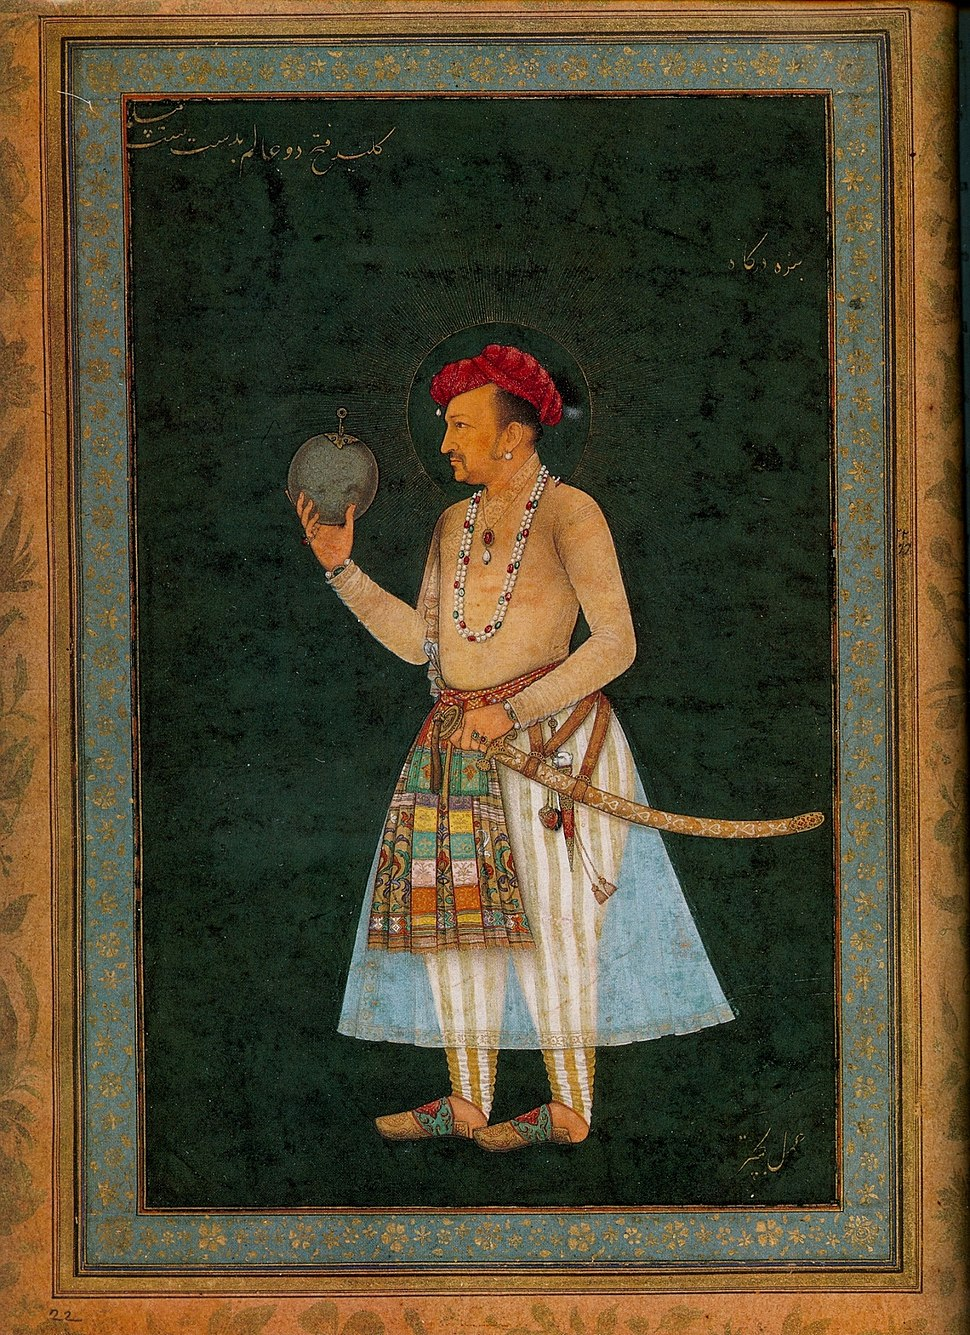 Jahangir holding a globe, 1614-1618